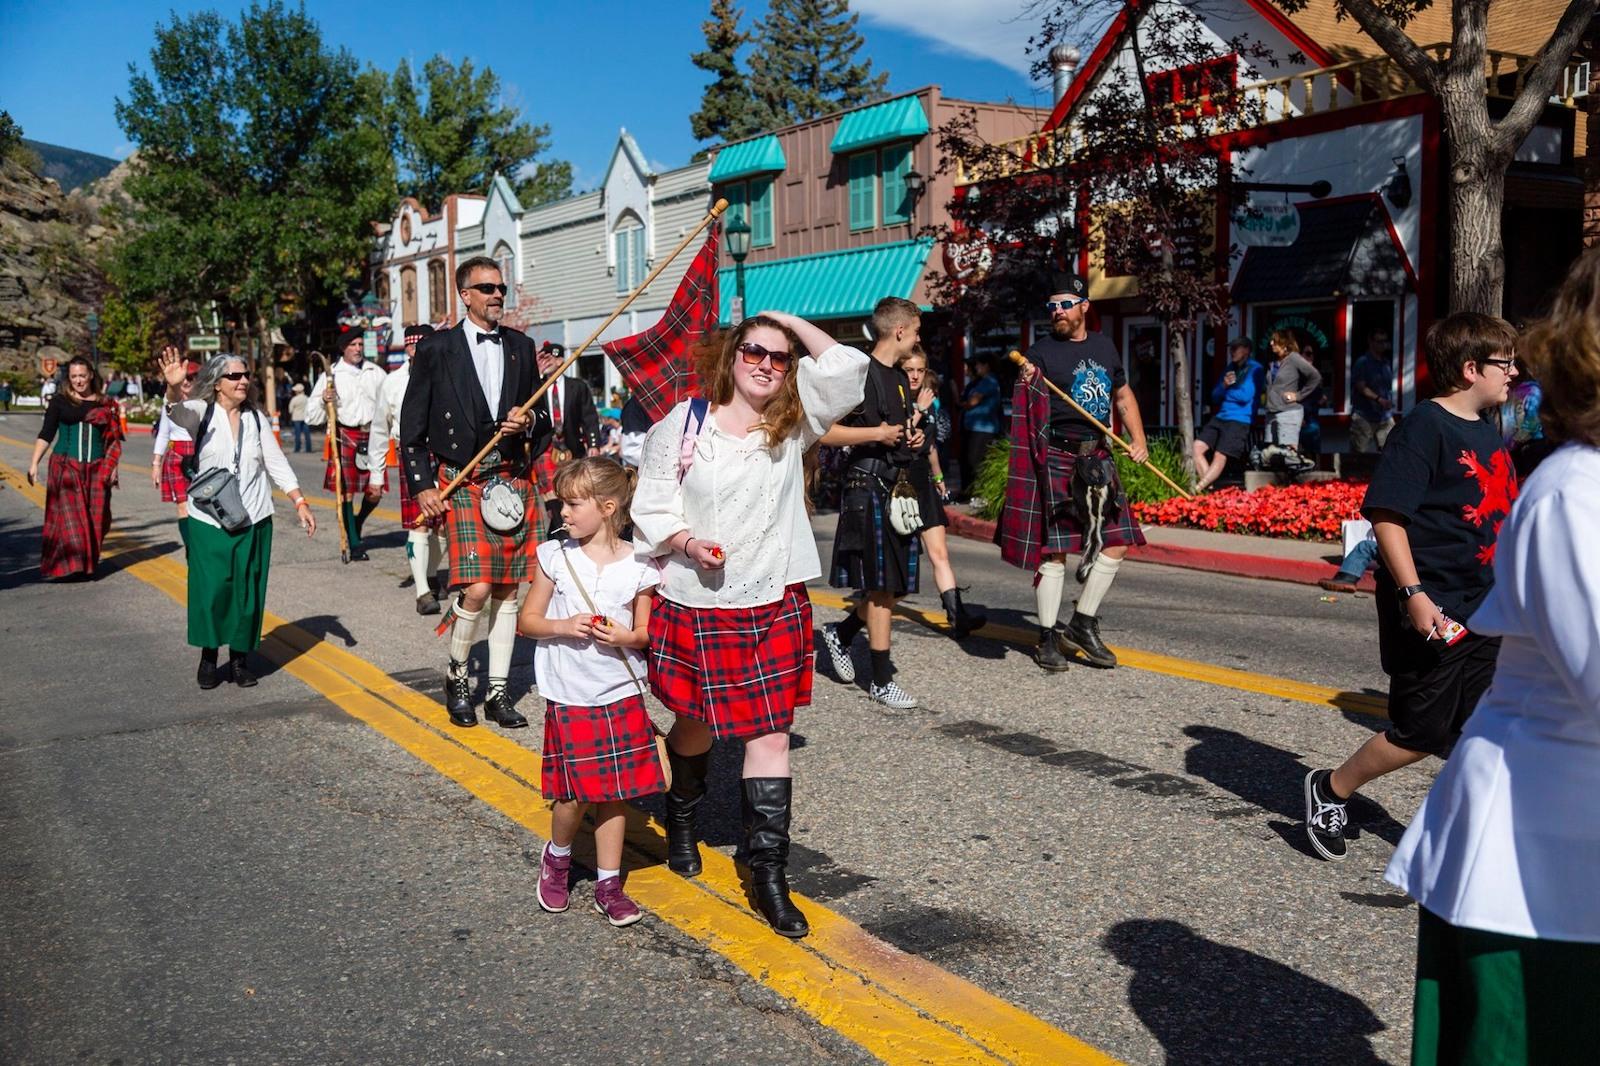 Gambar orang berjalan di parade Festival Dataran Tinggi Skotlandia-Irlandia Long's Peak di Estes Park, Colorado